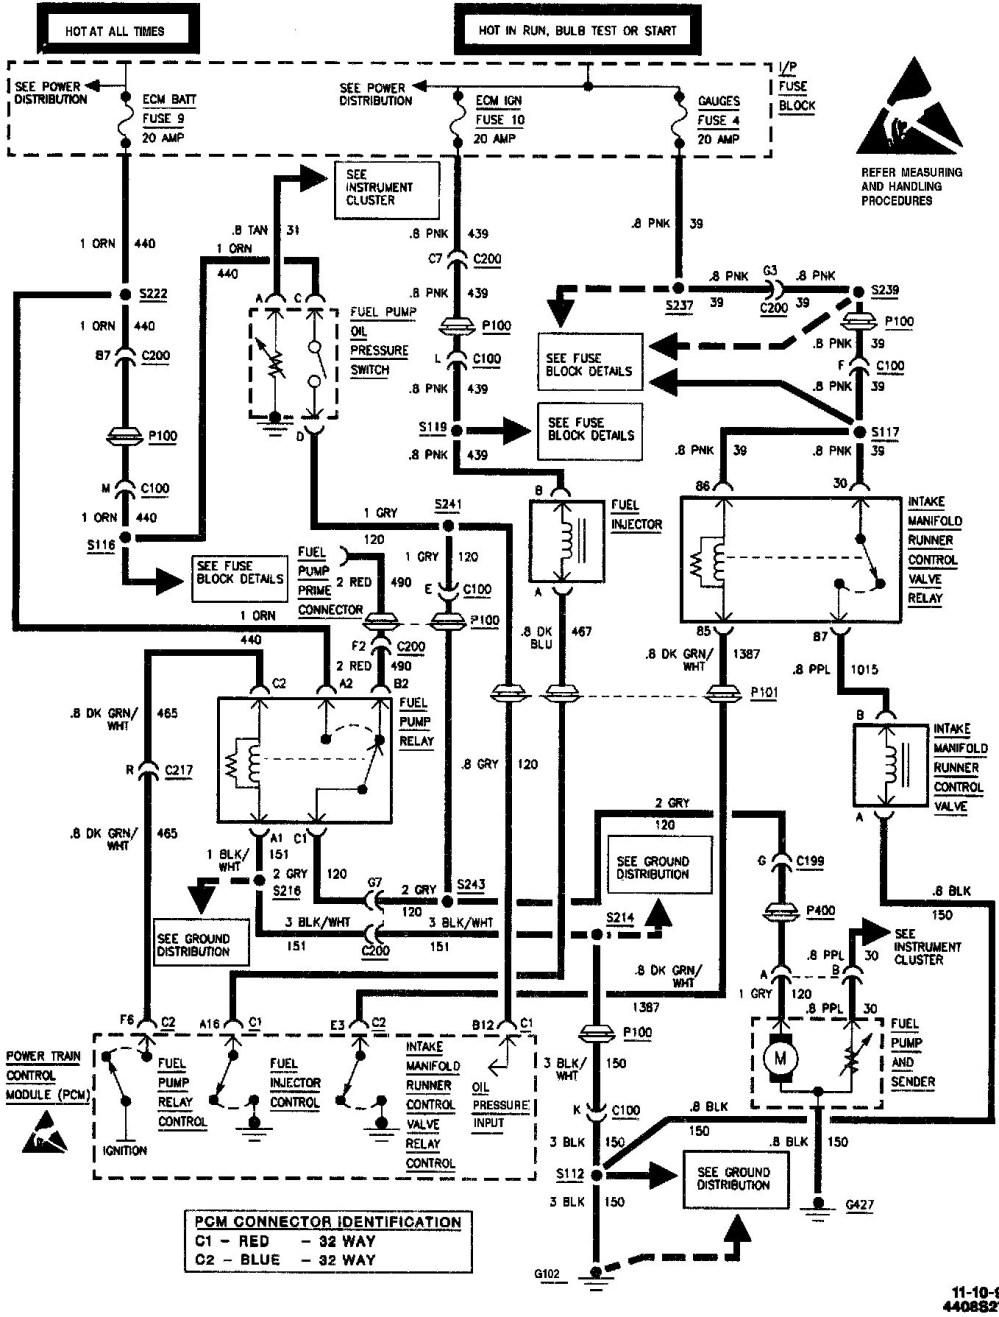 medium resolution of 1995 s10 engine diagram box wiring diagram95 chevy s10 wiring diagram wiring diagrams lol 1995 s10